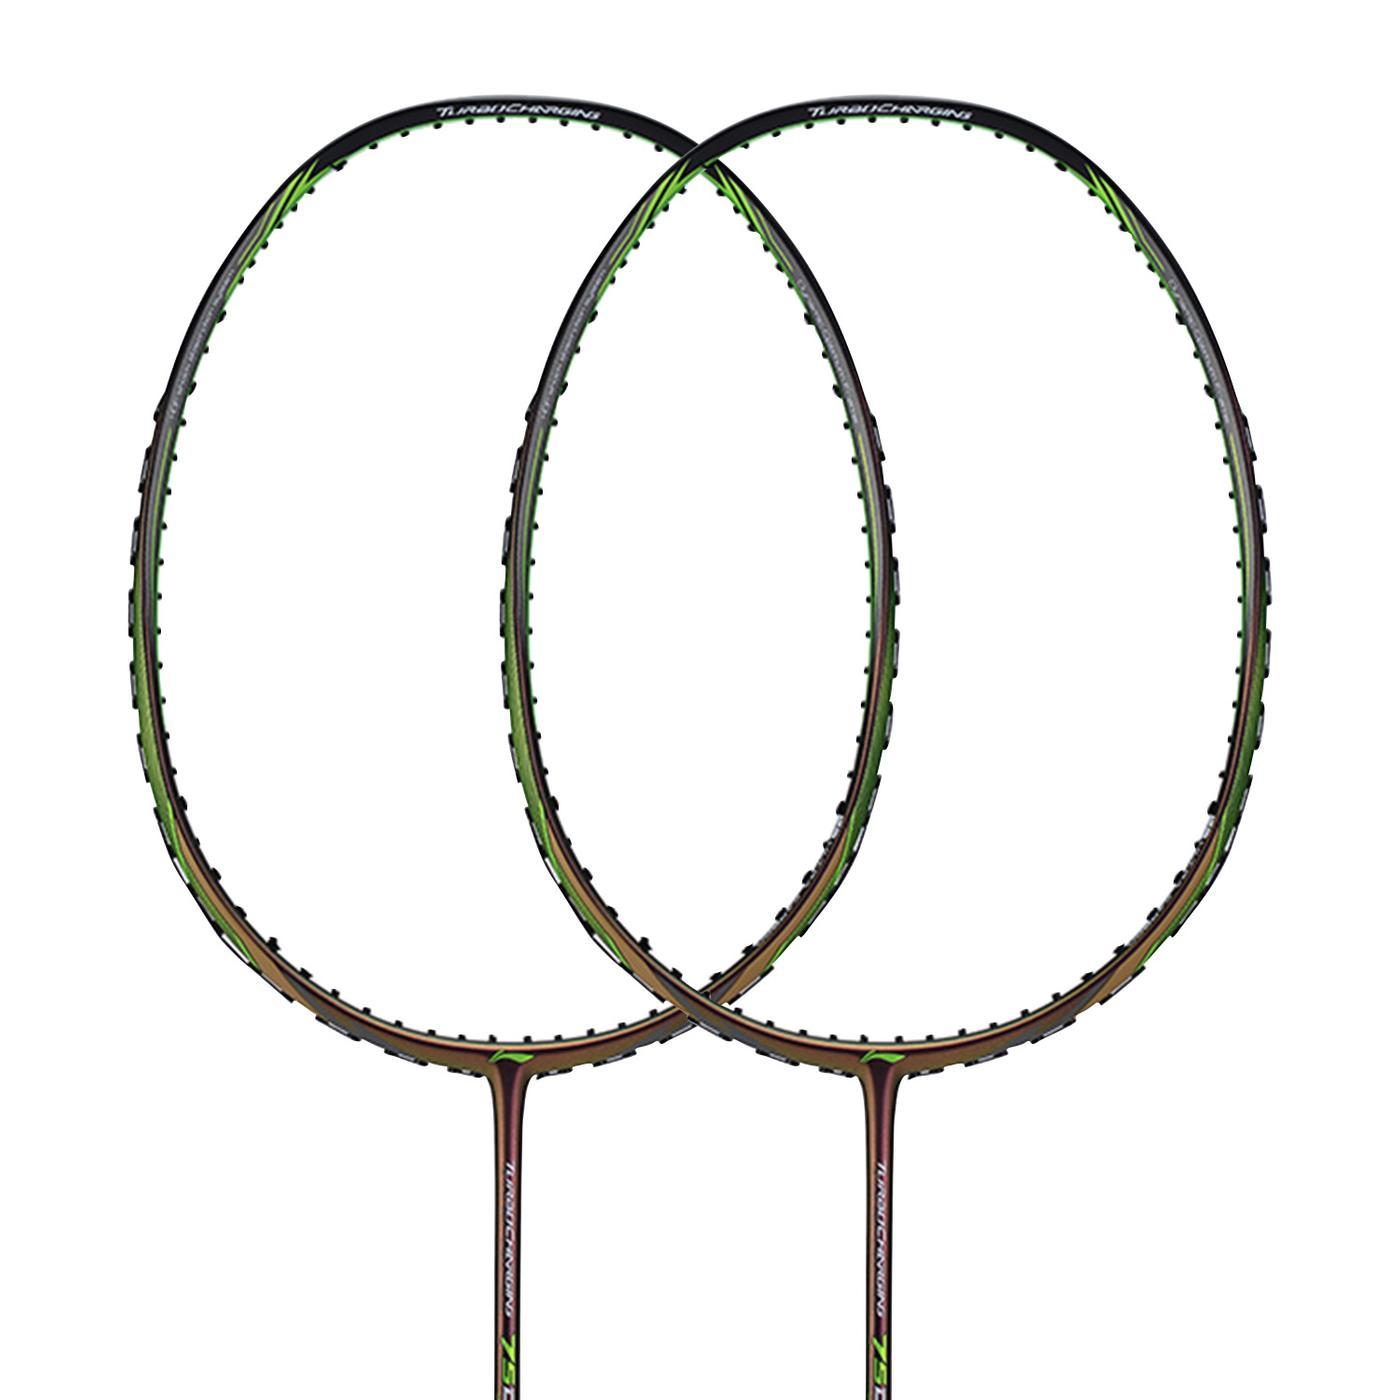 Li Ning Turbo Charging 75 Drive Badminton Racket  - Green